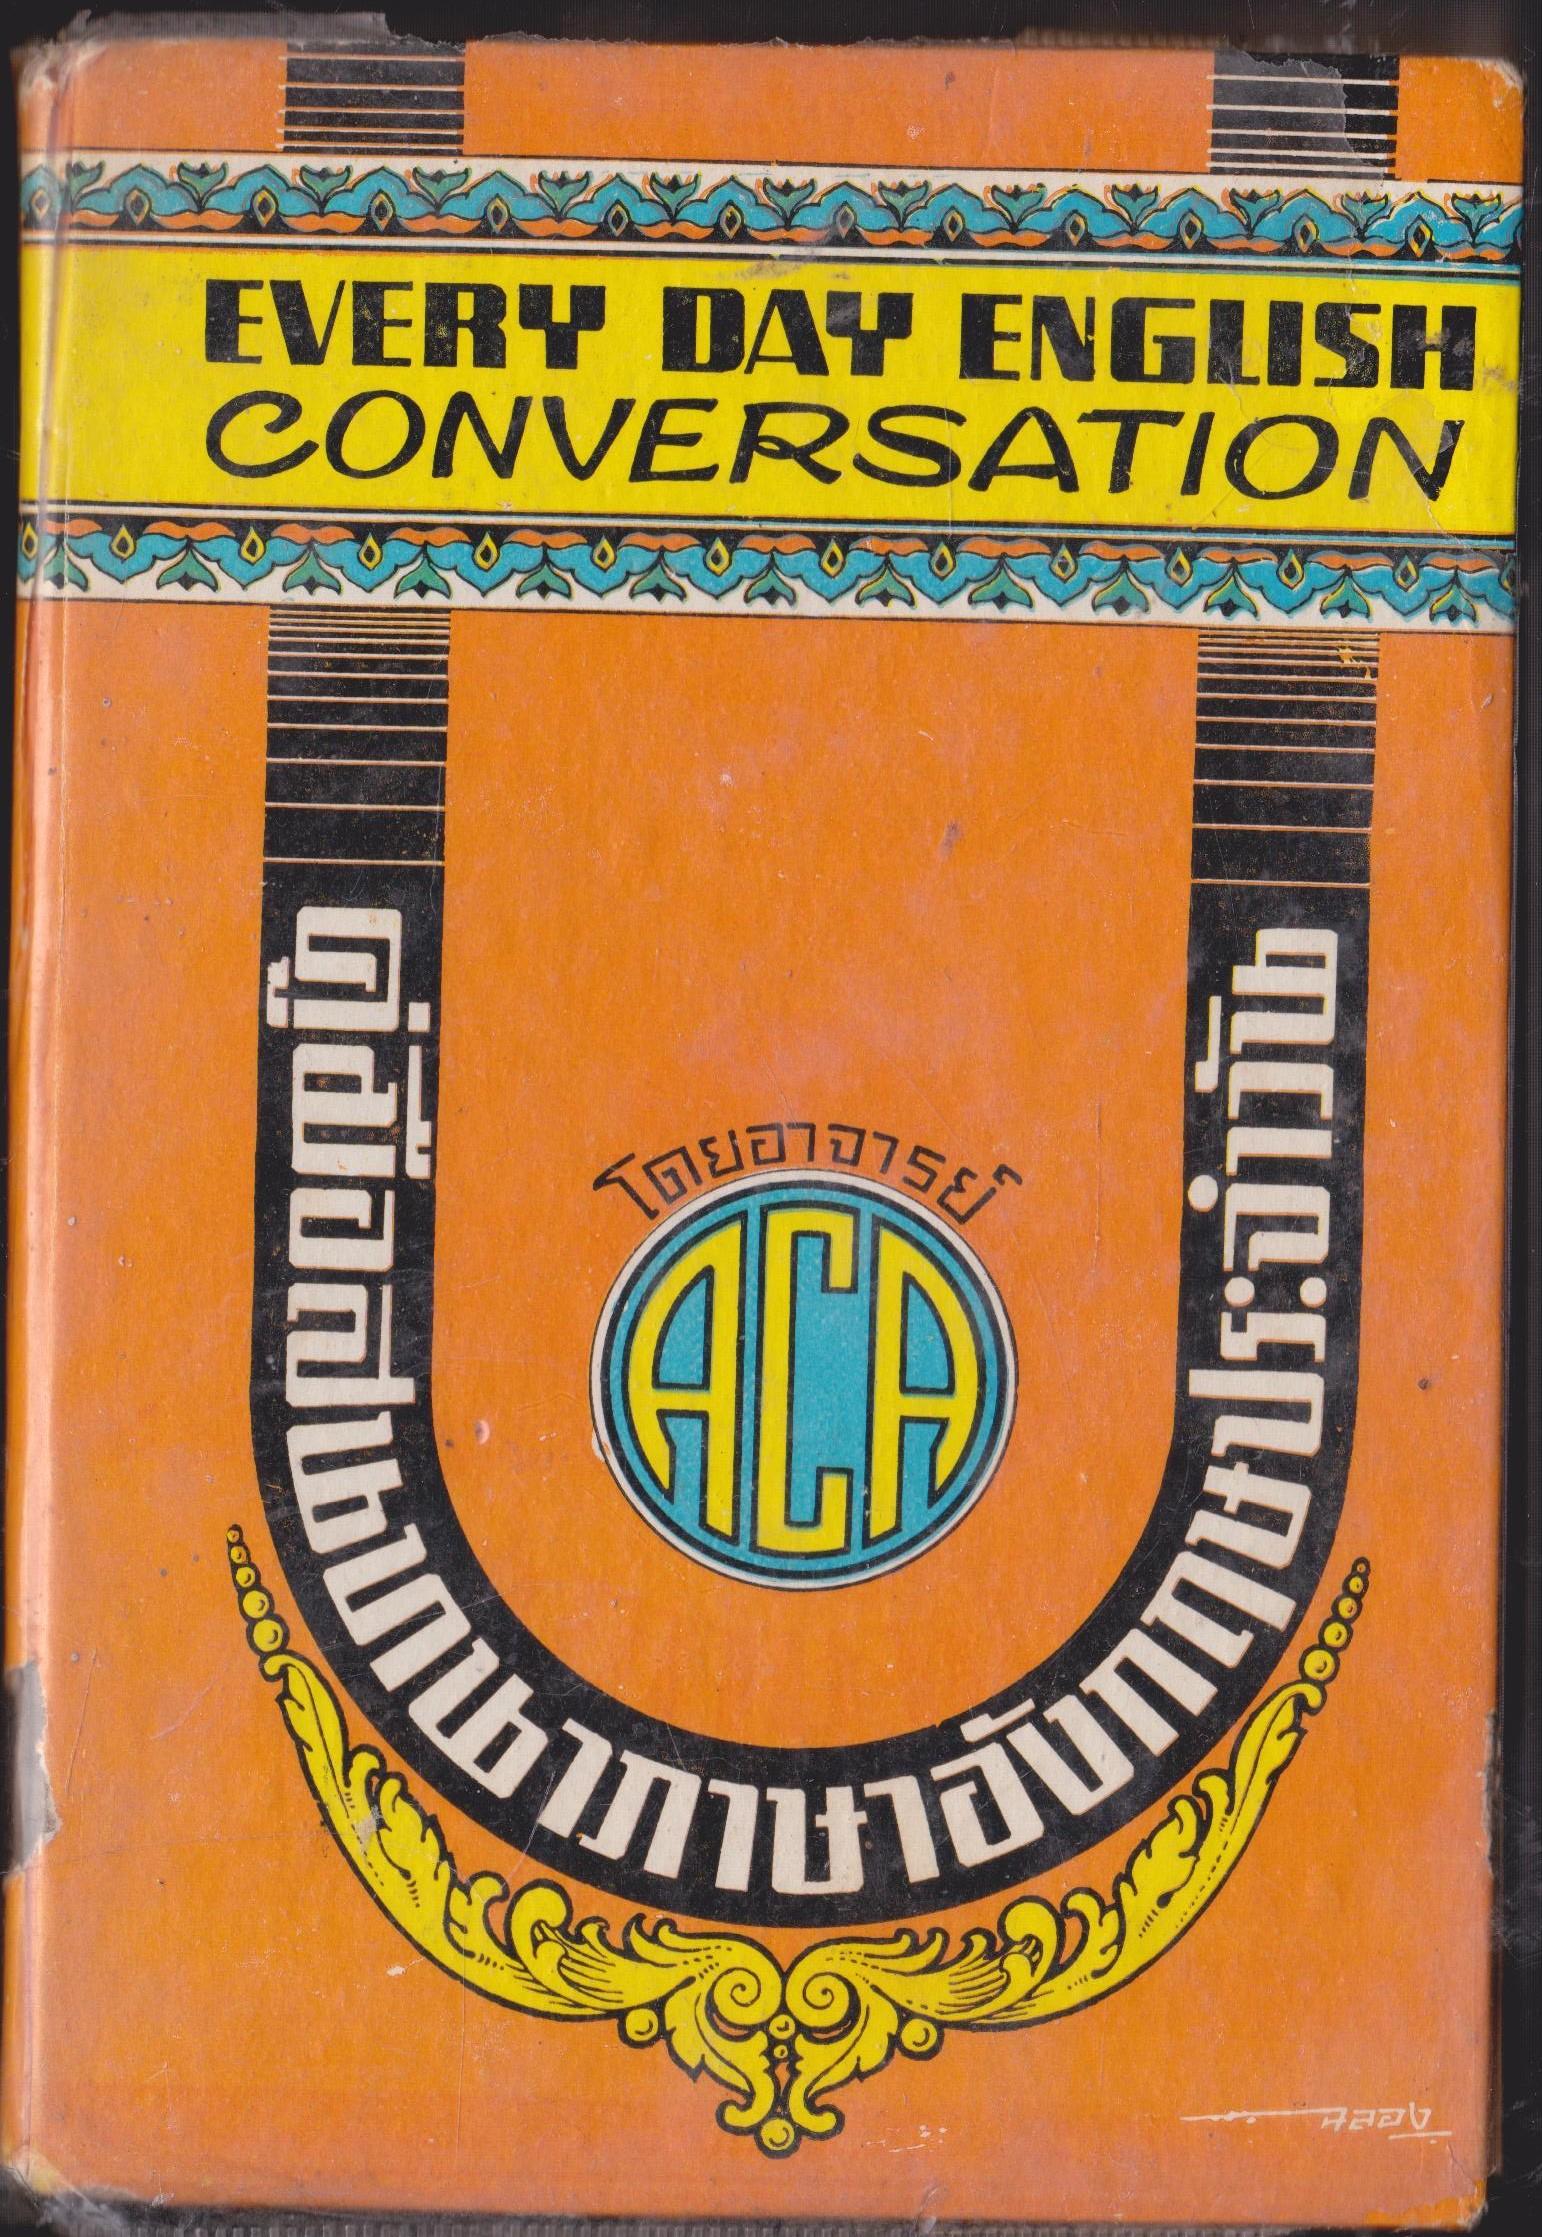 EVER DAY ENGLISH CONVERASTION คู่มือสนทนาภาษาอังกฤษประจำวัน